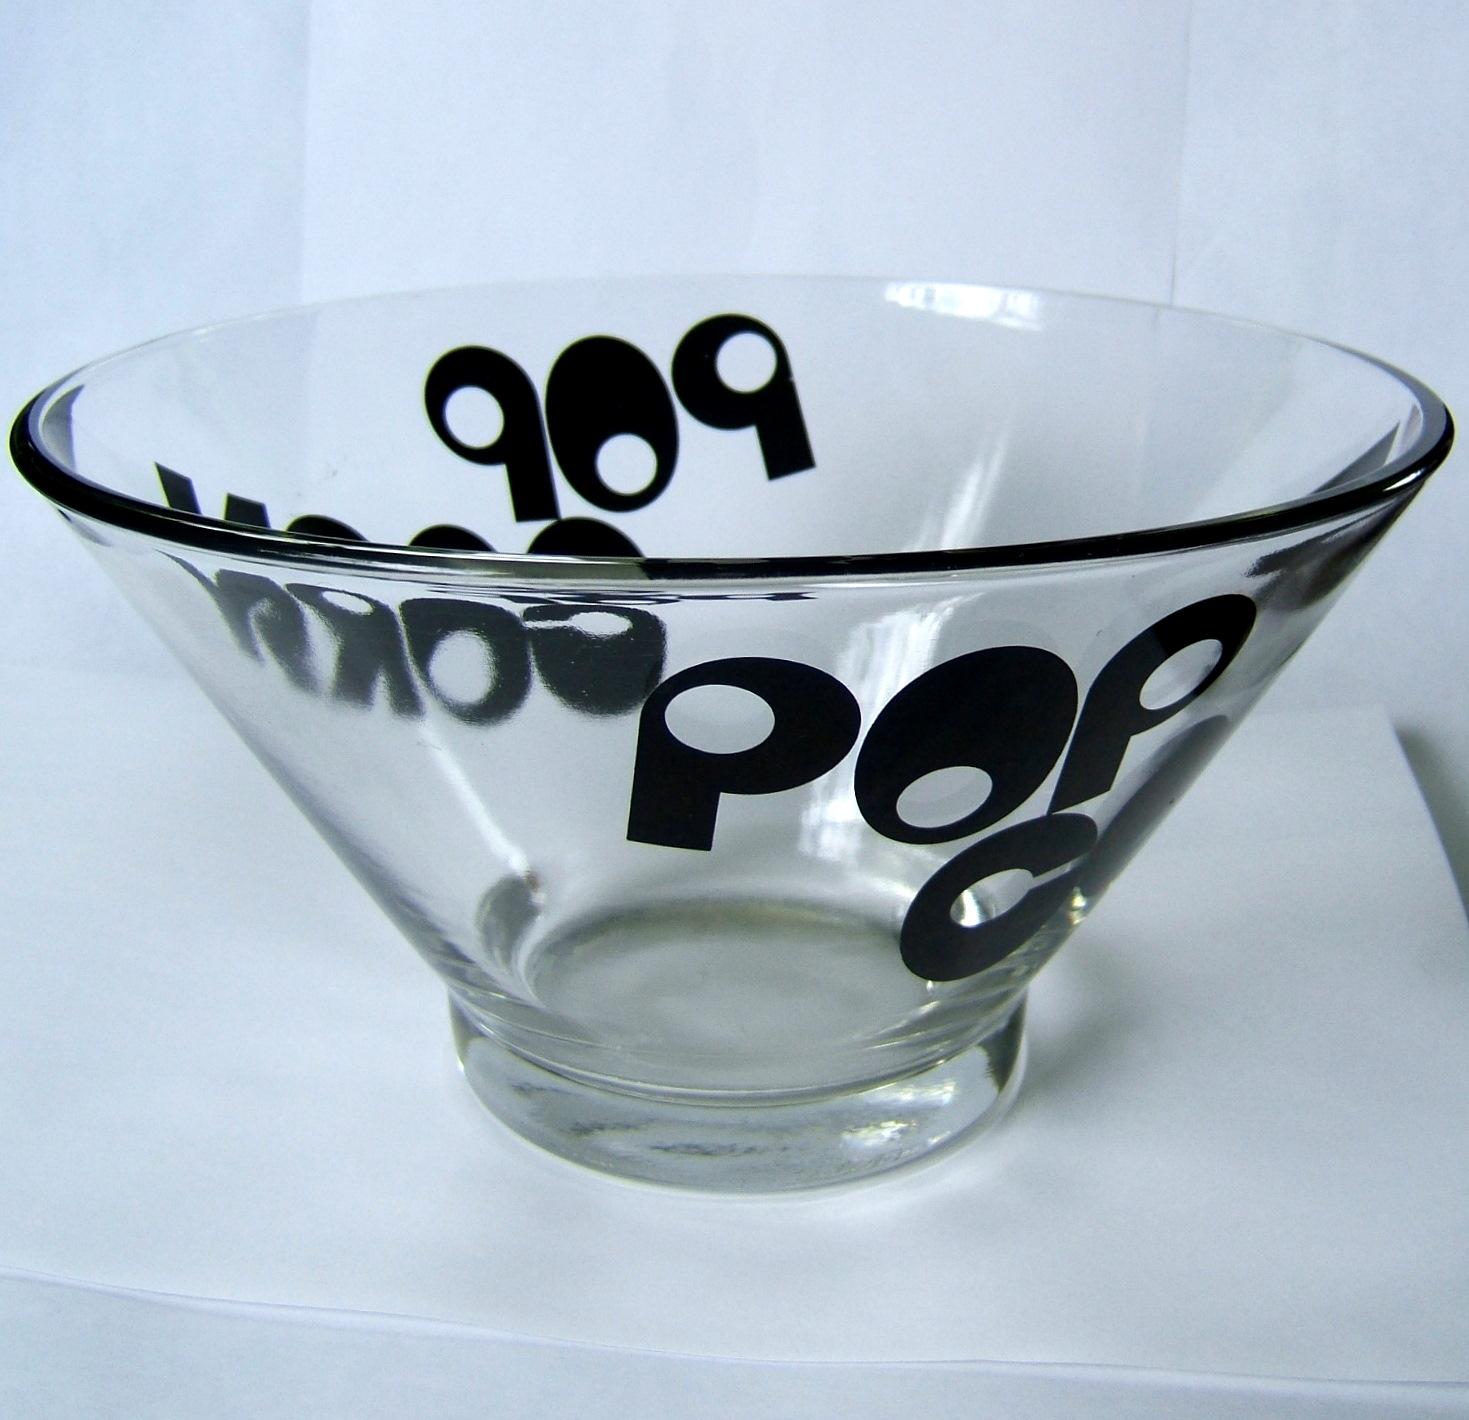 Vintage Popcorn Bowl 94